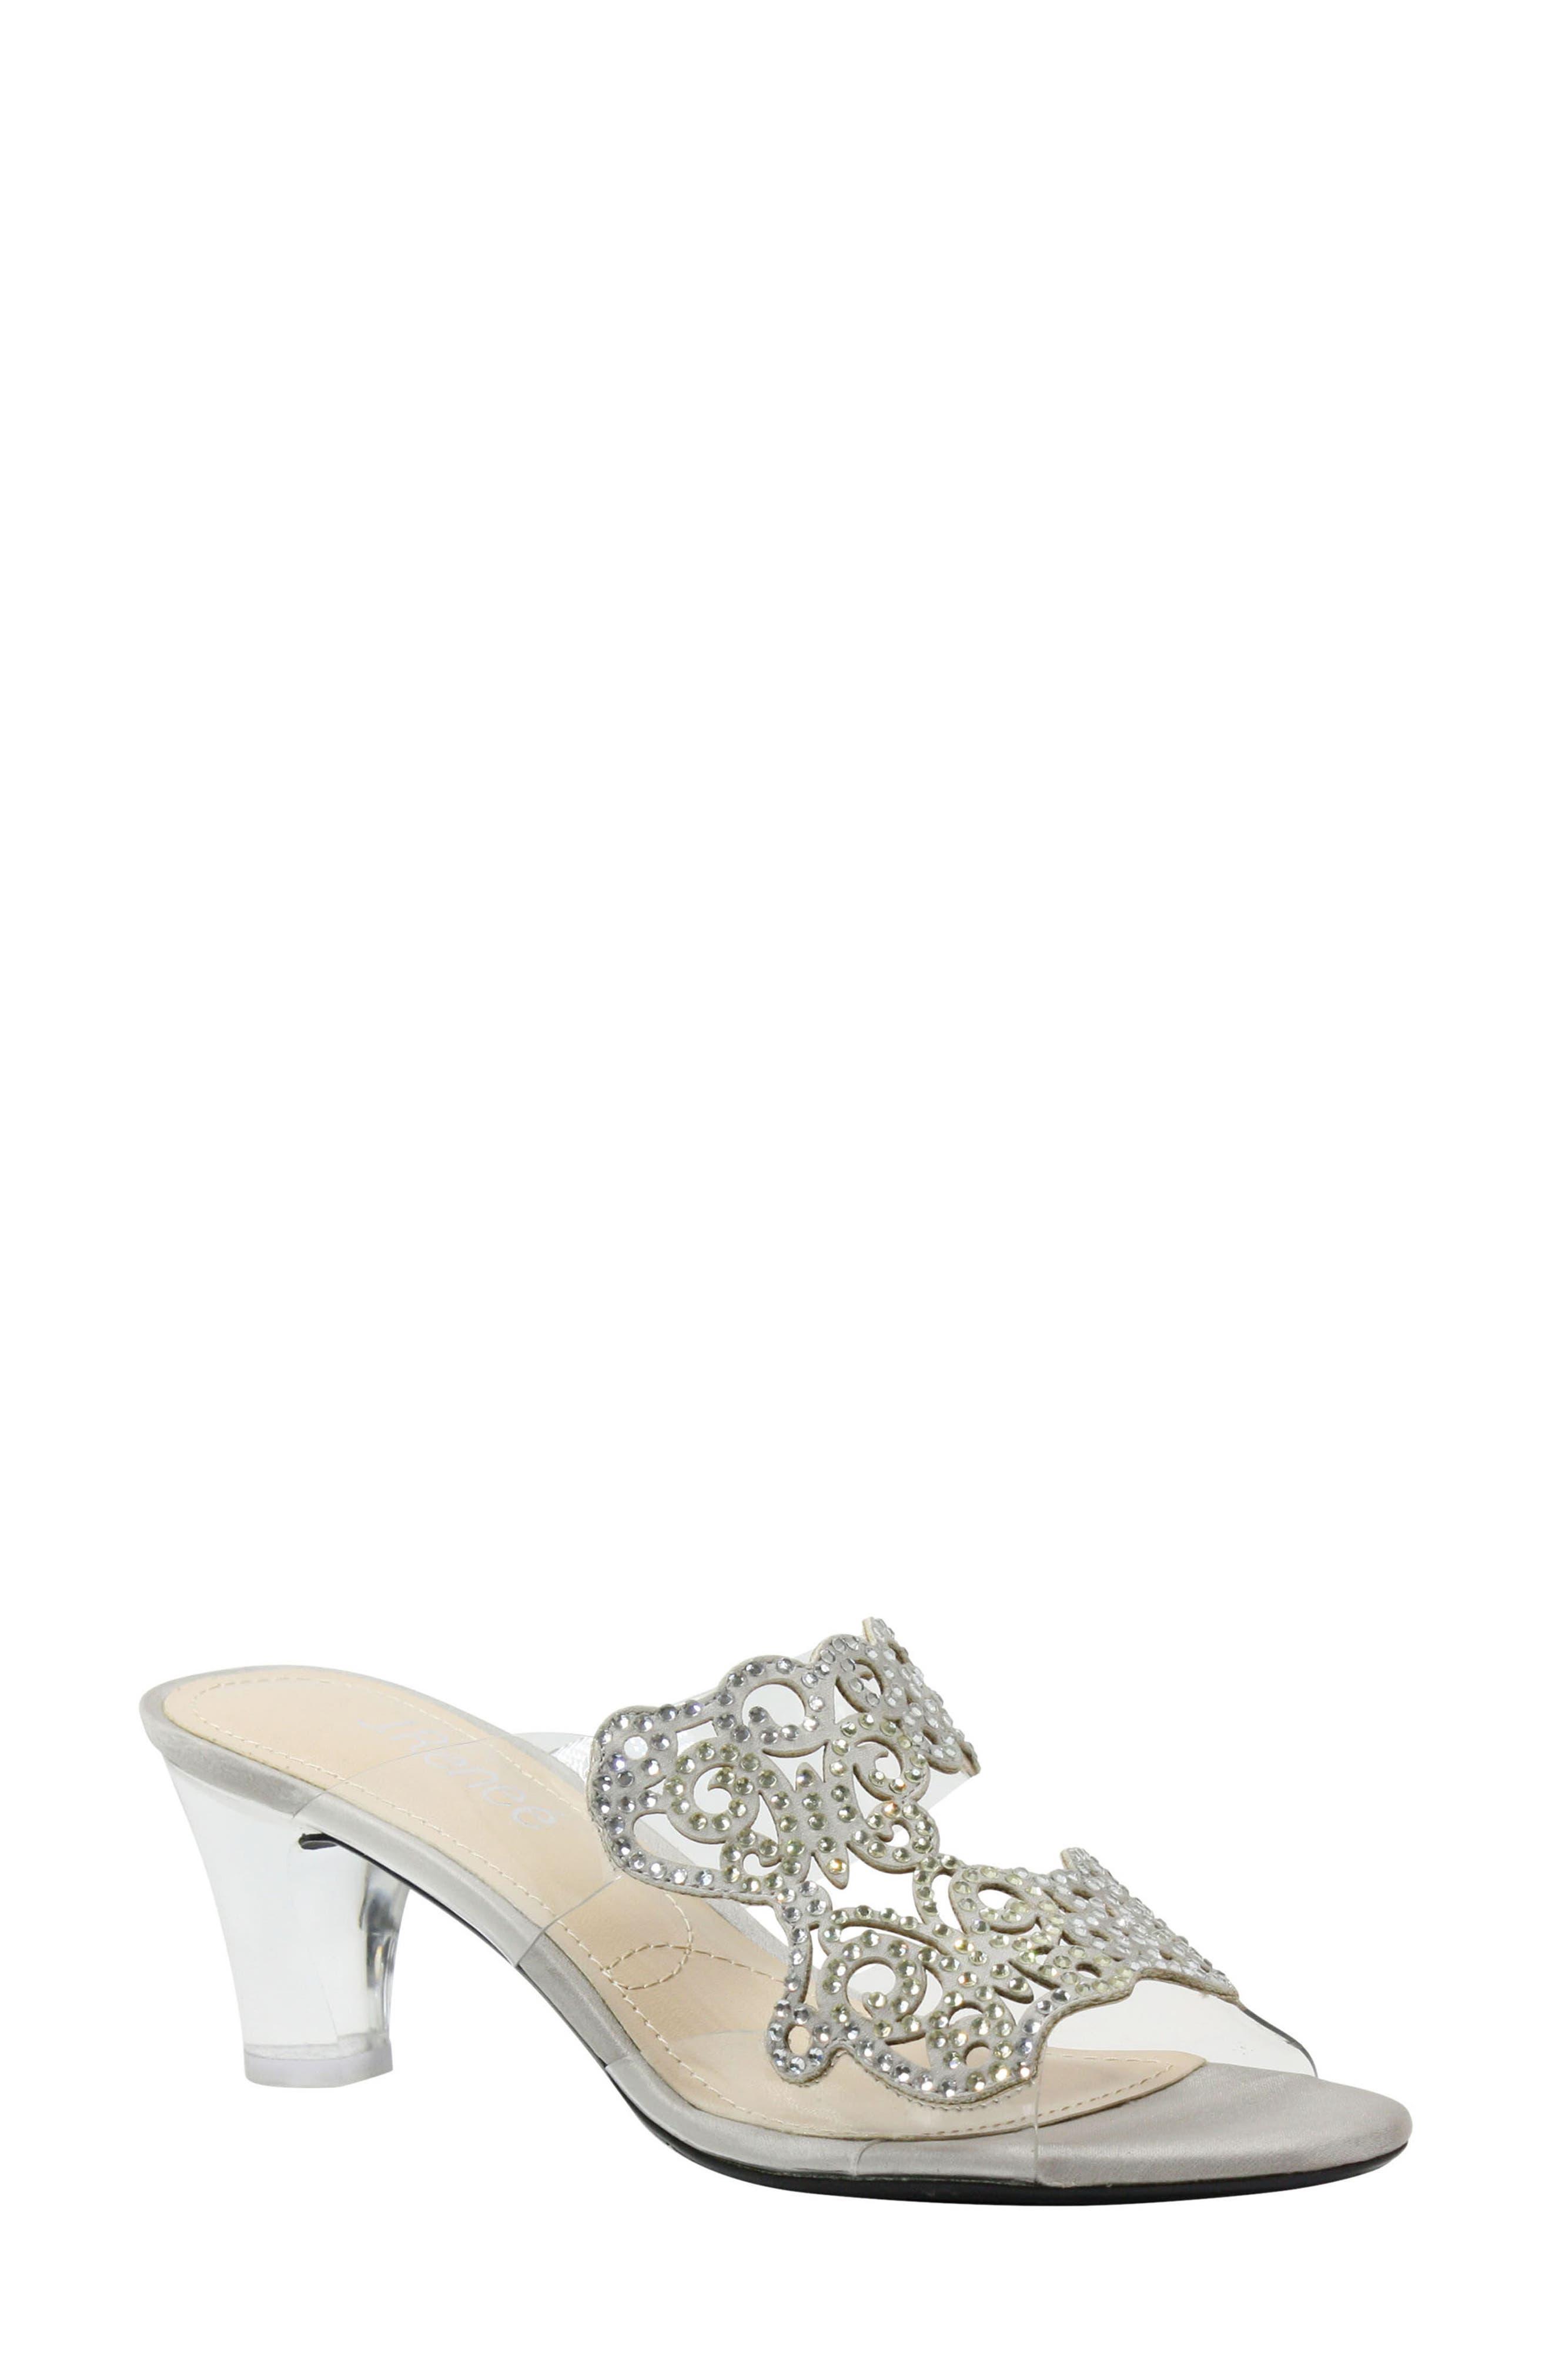 Sabreen Crystal Embellished Sandal,                             Main thumbnail 1, color,                             SILVER/ CLEAR